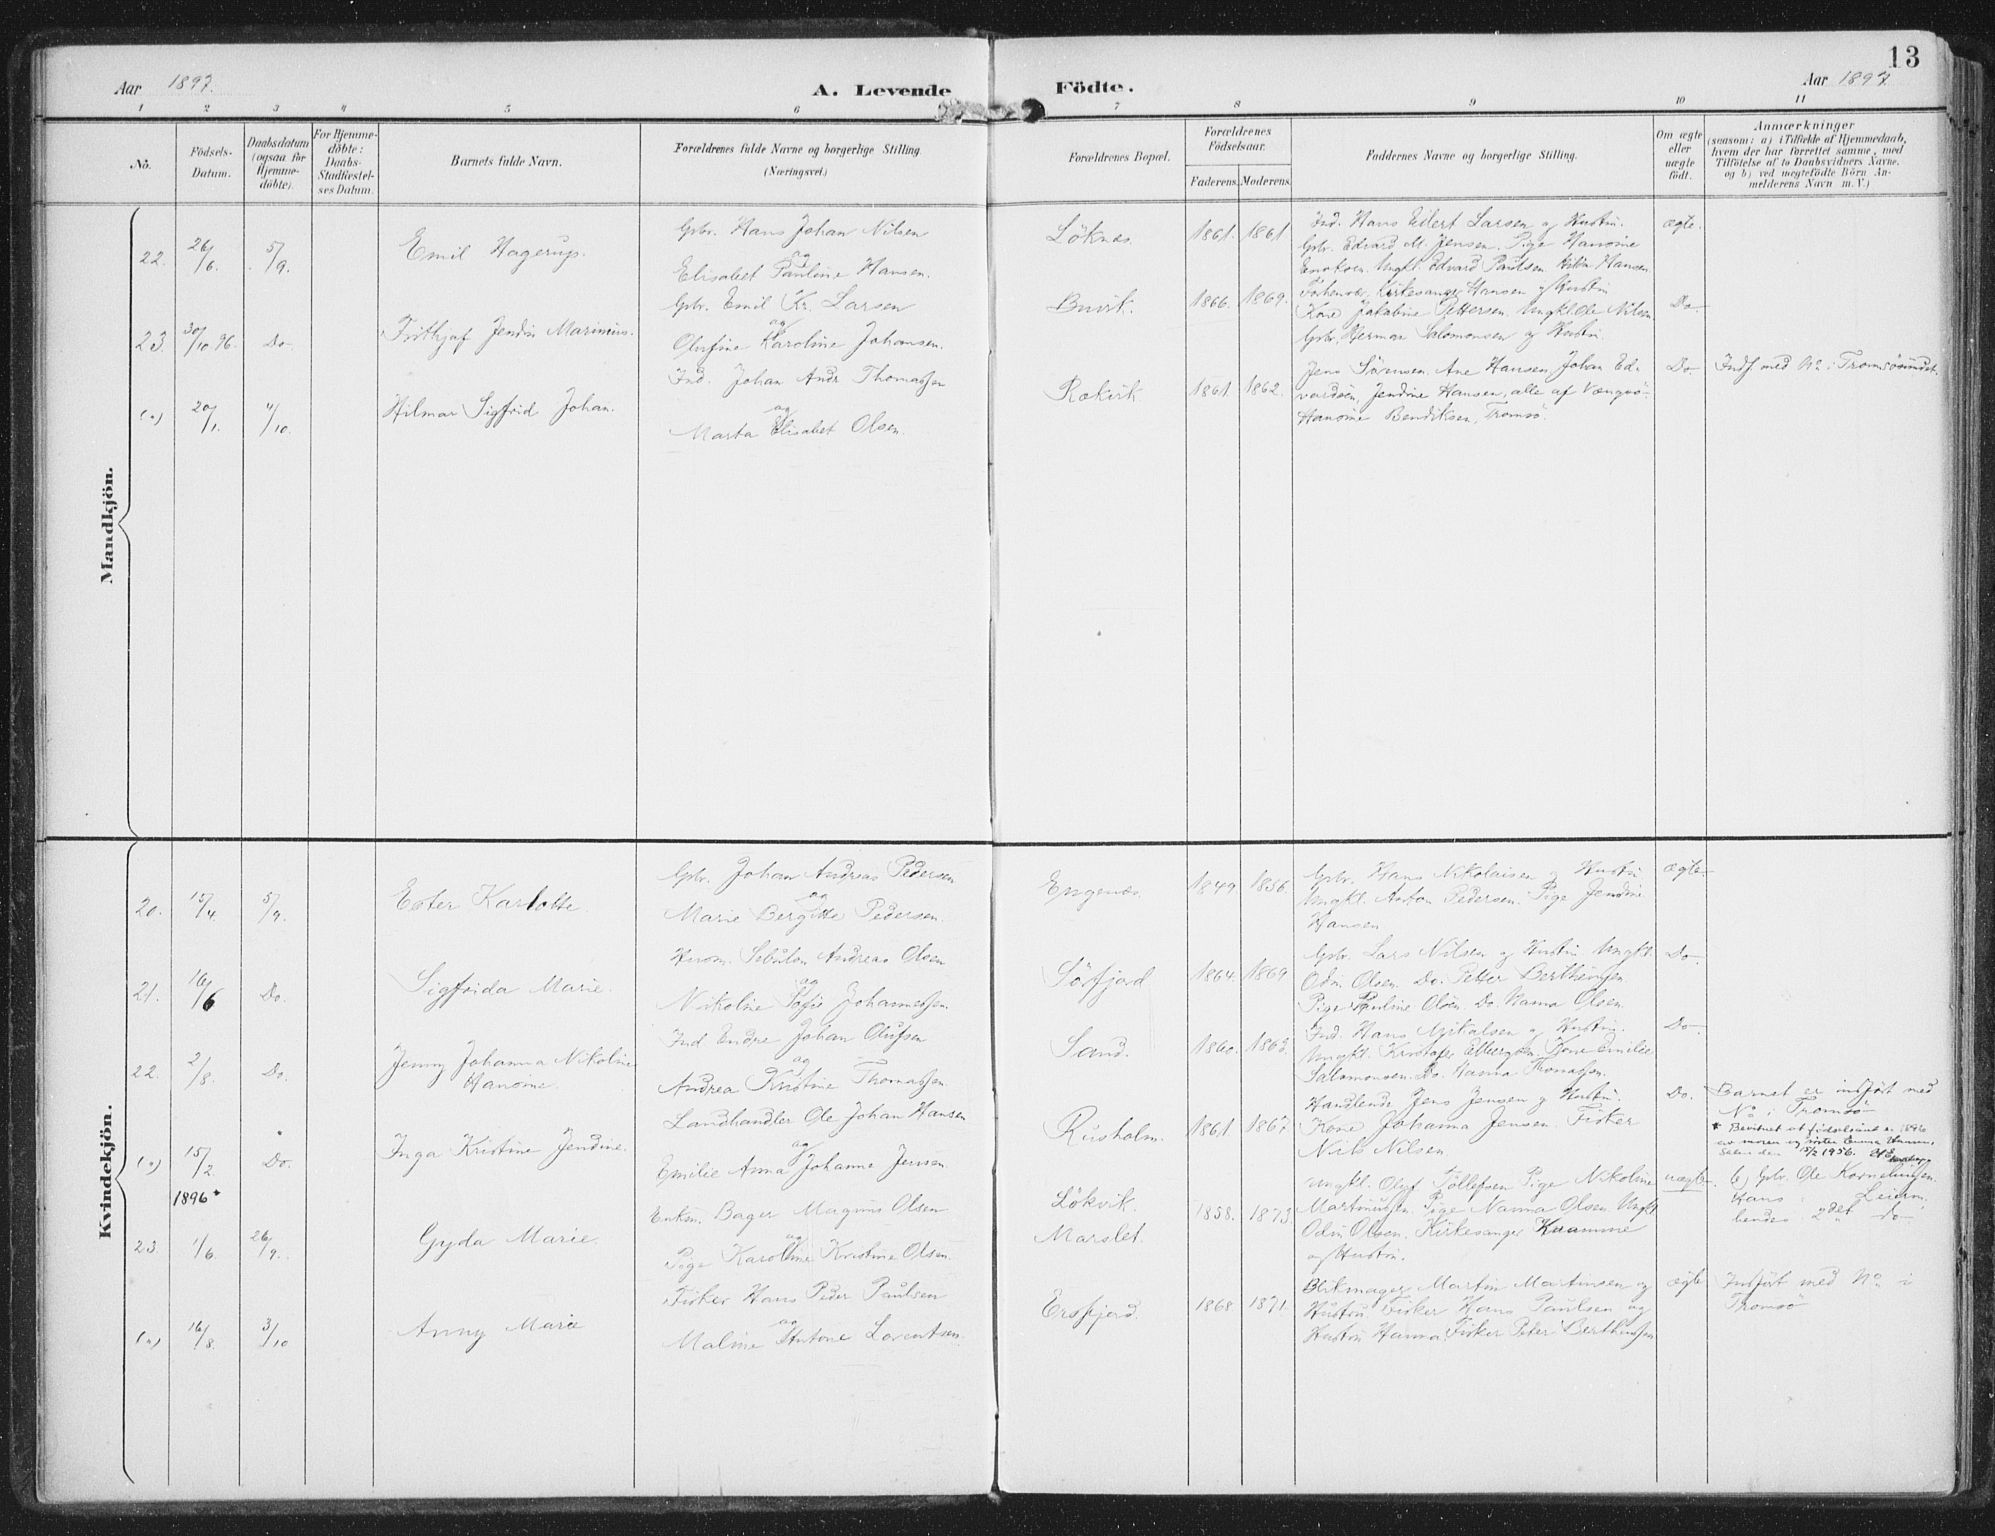 SATØ, Lenvik sokneprestembete, H/Ha/Haa/L0015kirke: Ministerialbok nr. 15, 1896-1915, s. 13